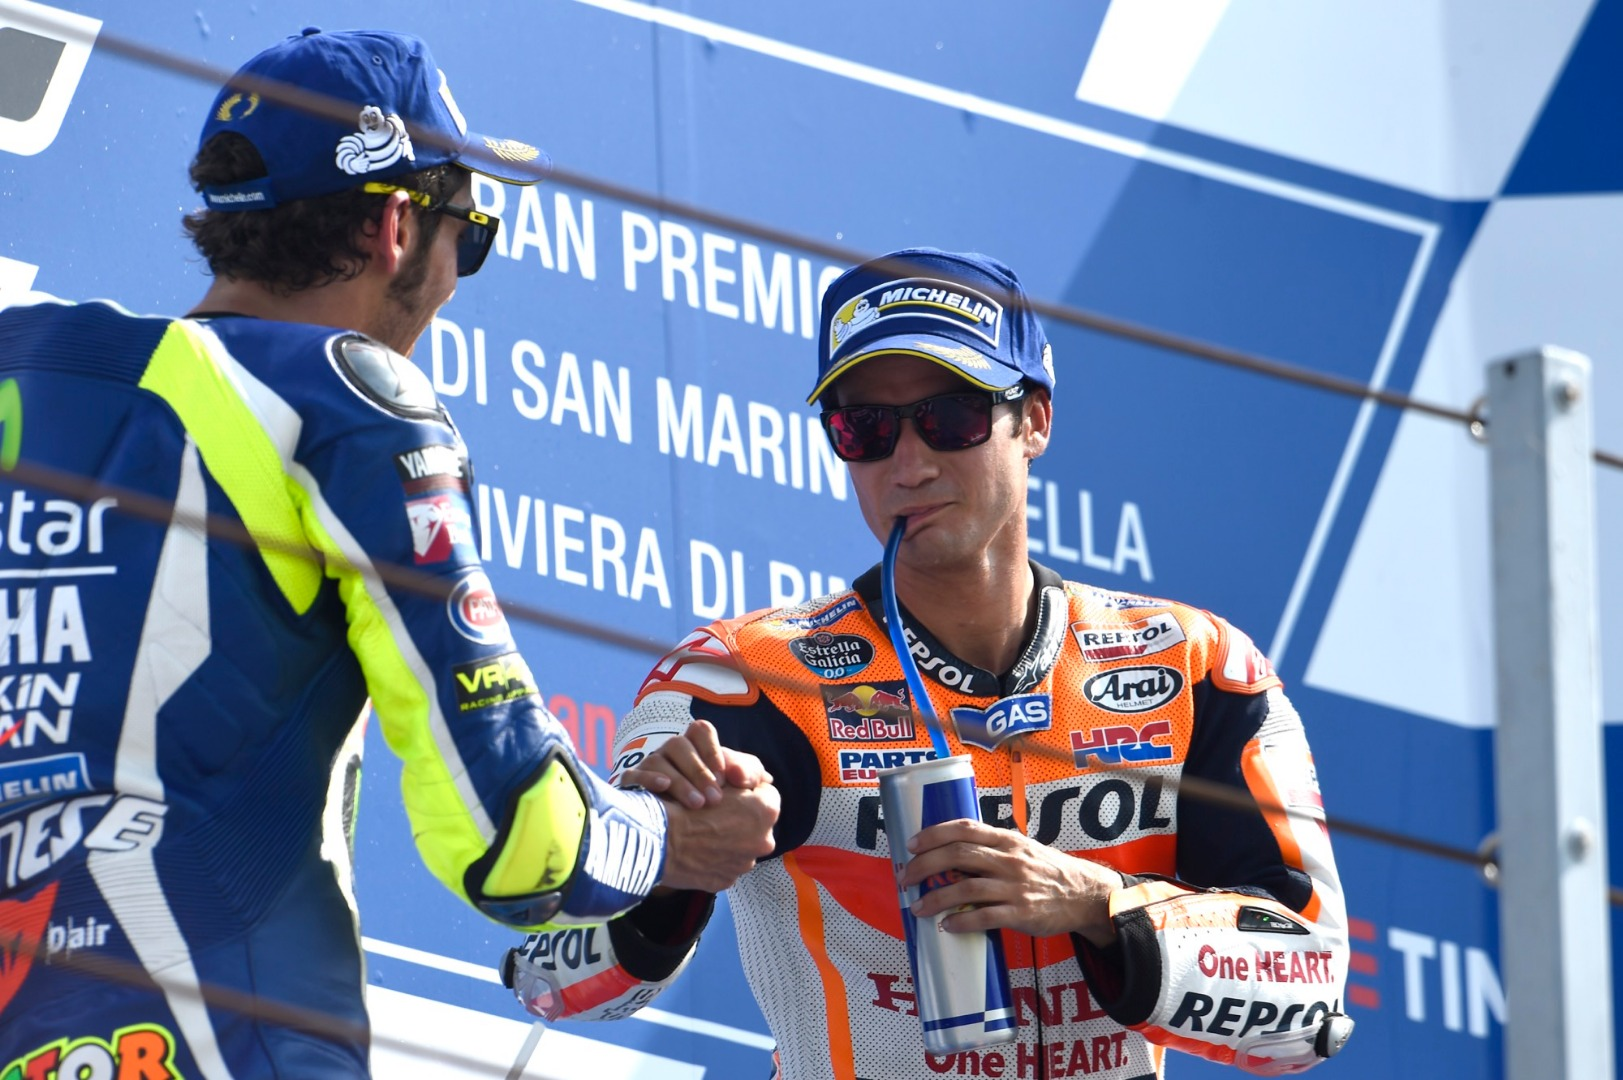 Grandes momentos de Dani Pedrosa en Honda